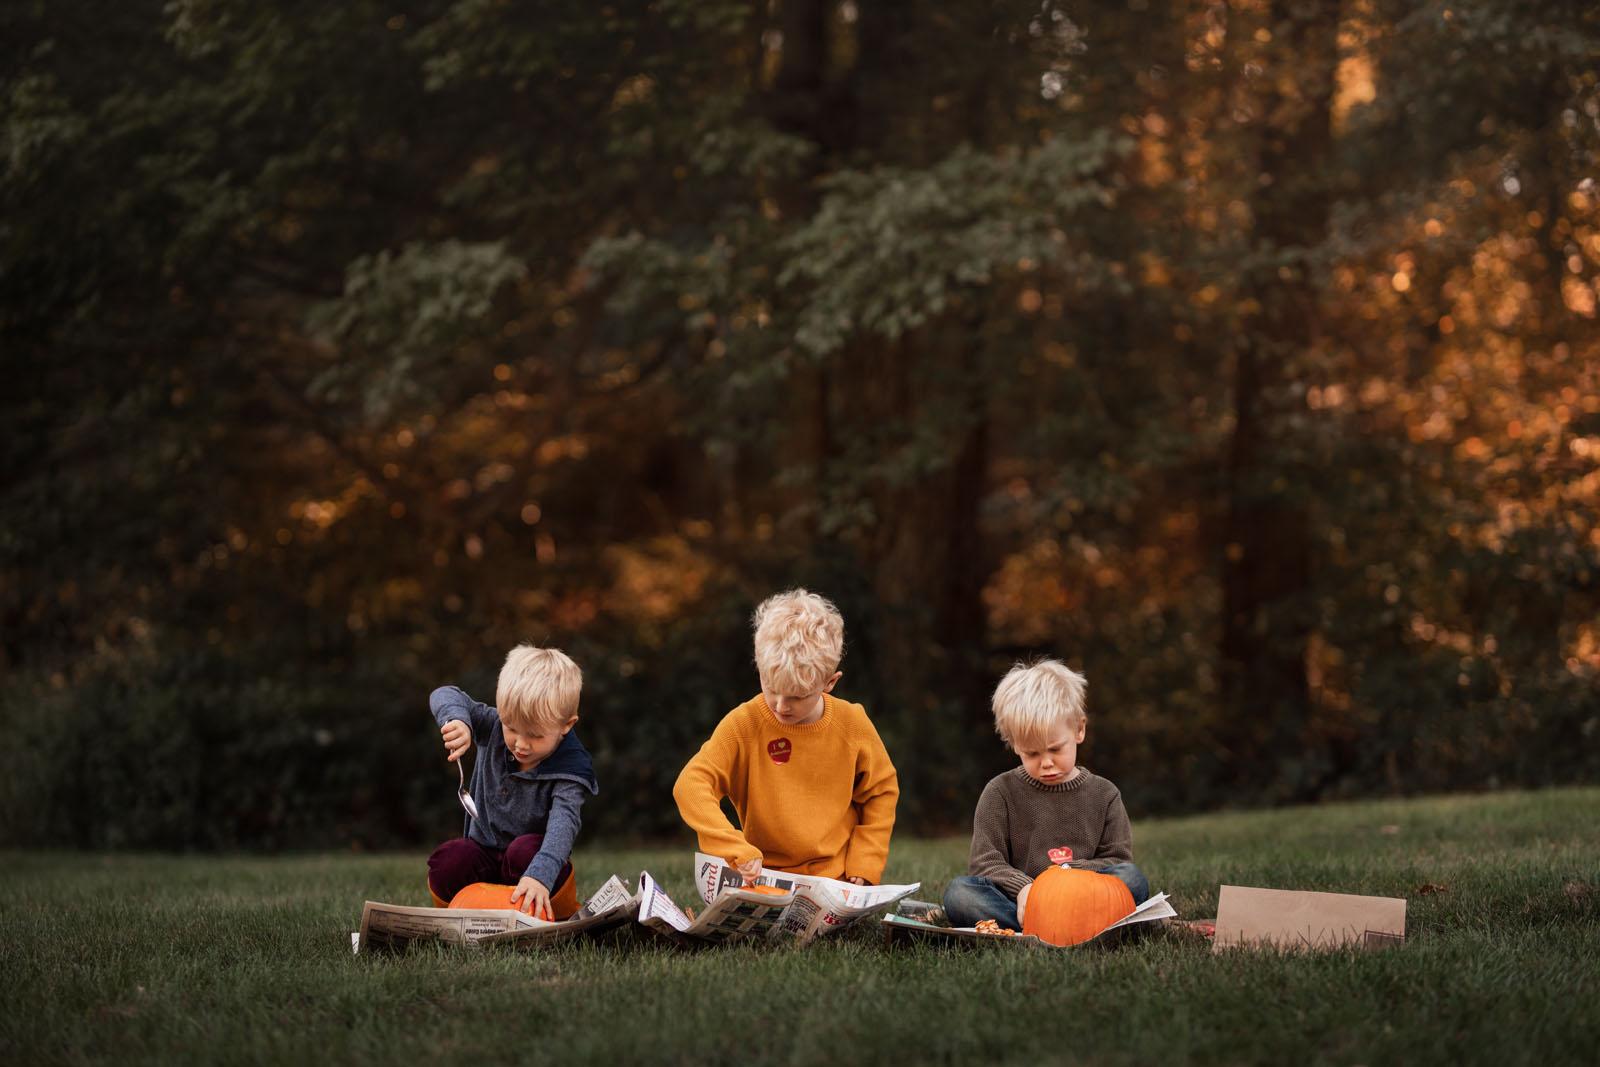 megloeks_image9 three small boys carving pumpkins in grass fall activities by meg loeks